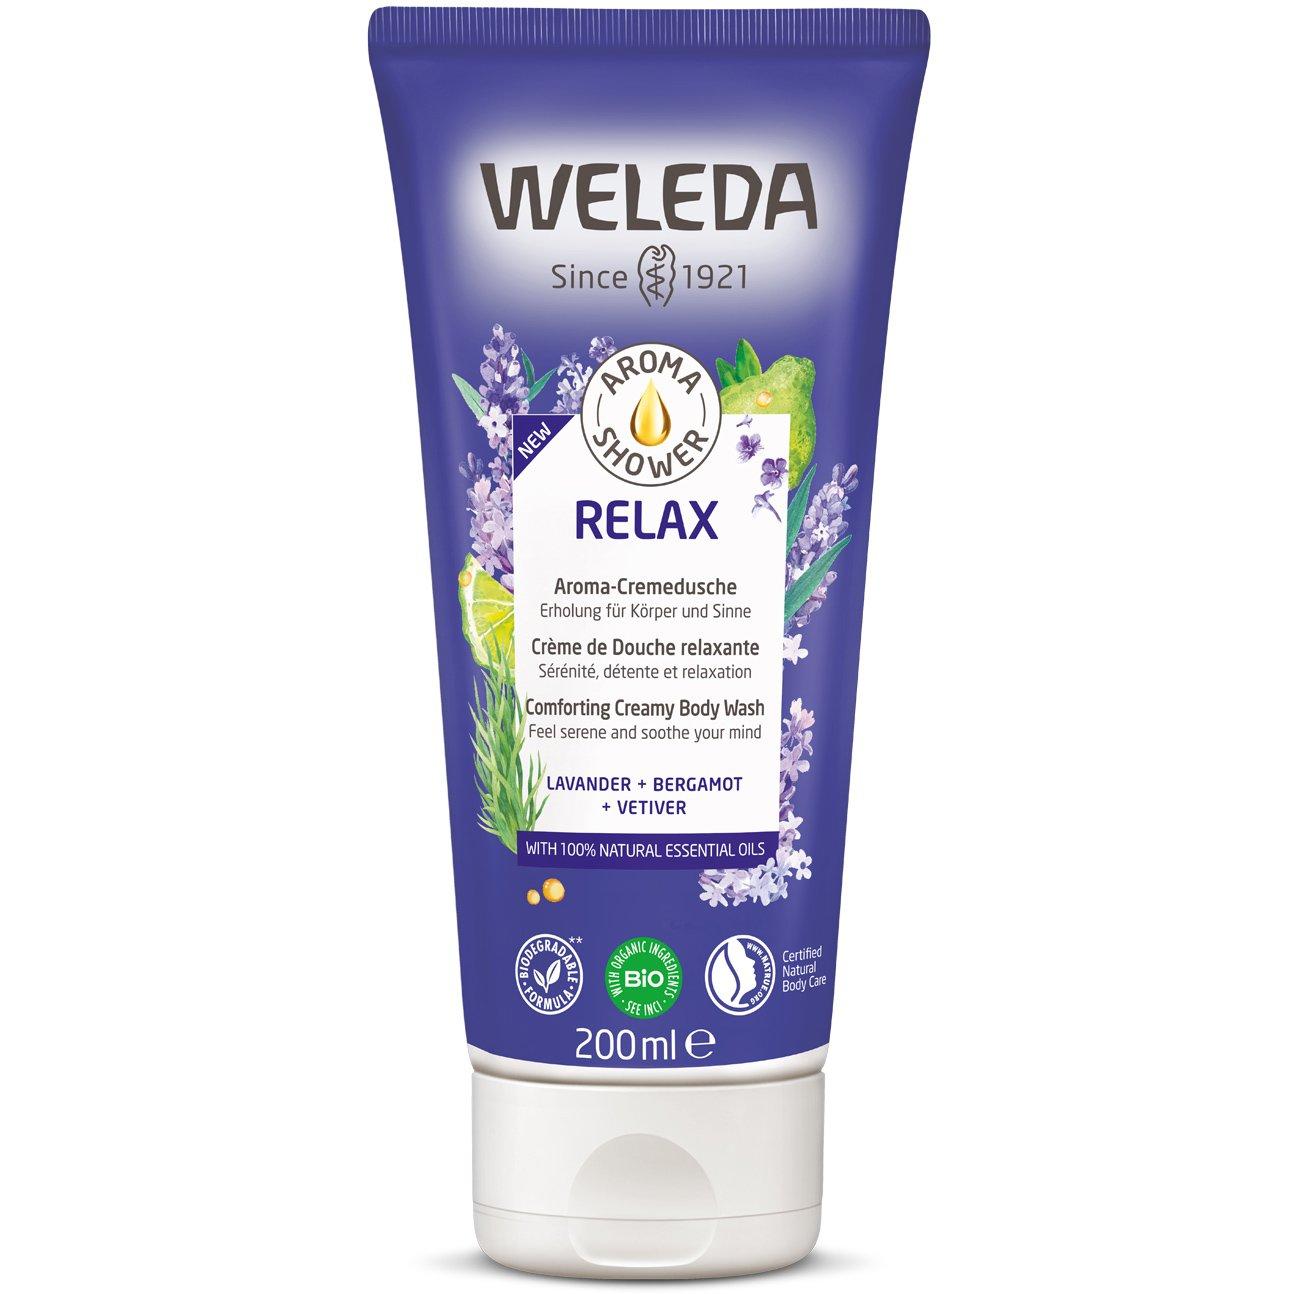 Weleda Relax Aroma Shower Creamy Body Wash Κρεμώδες Αφροντούς για Αίσθηση Χαλάρωσης 200ml